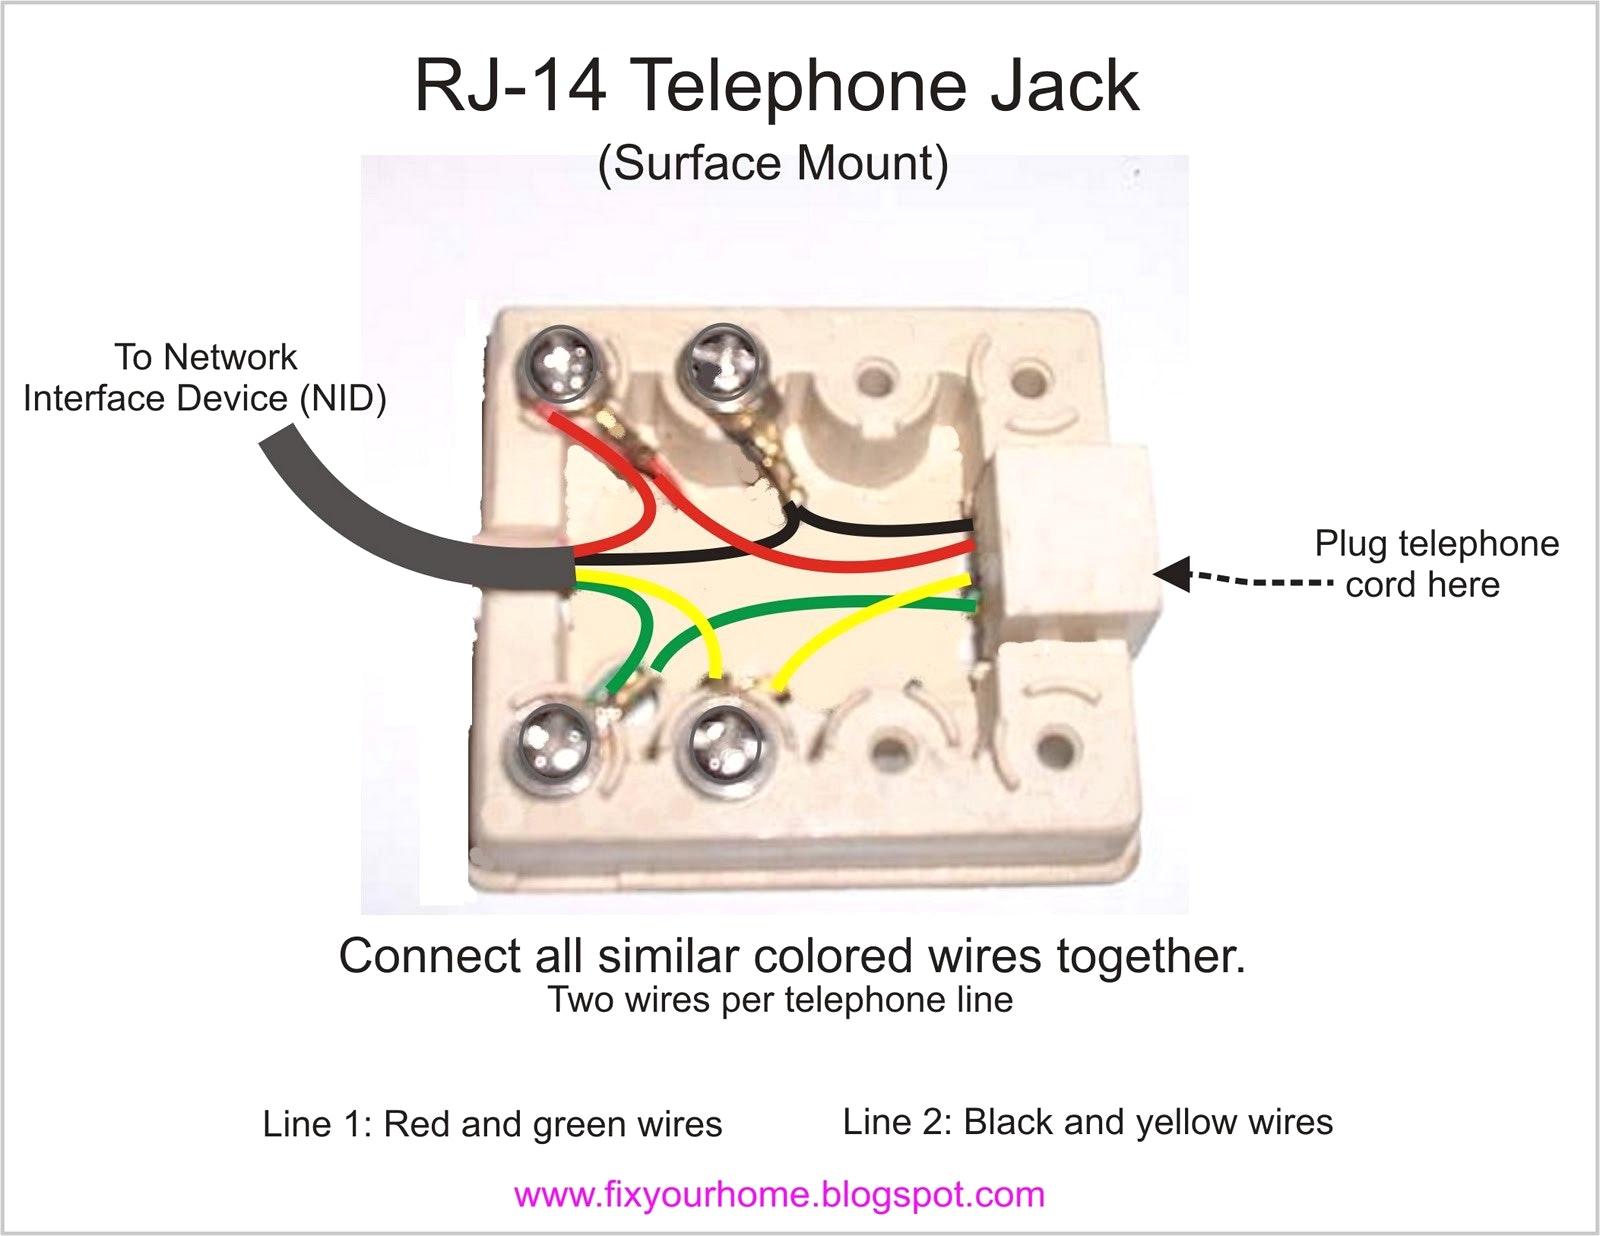 Phone Jack Wiring Diagram - Wiring Solution 2018 - Phone Jack Wiring Diagram